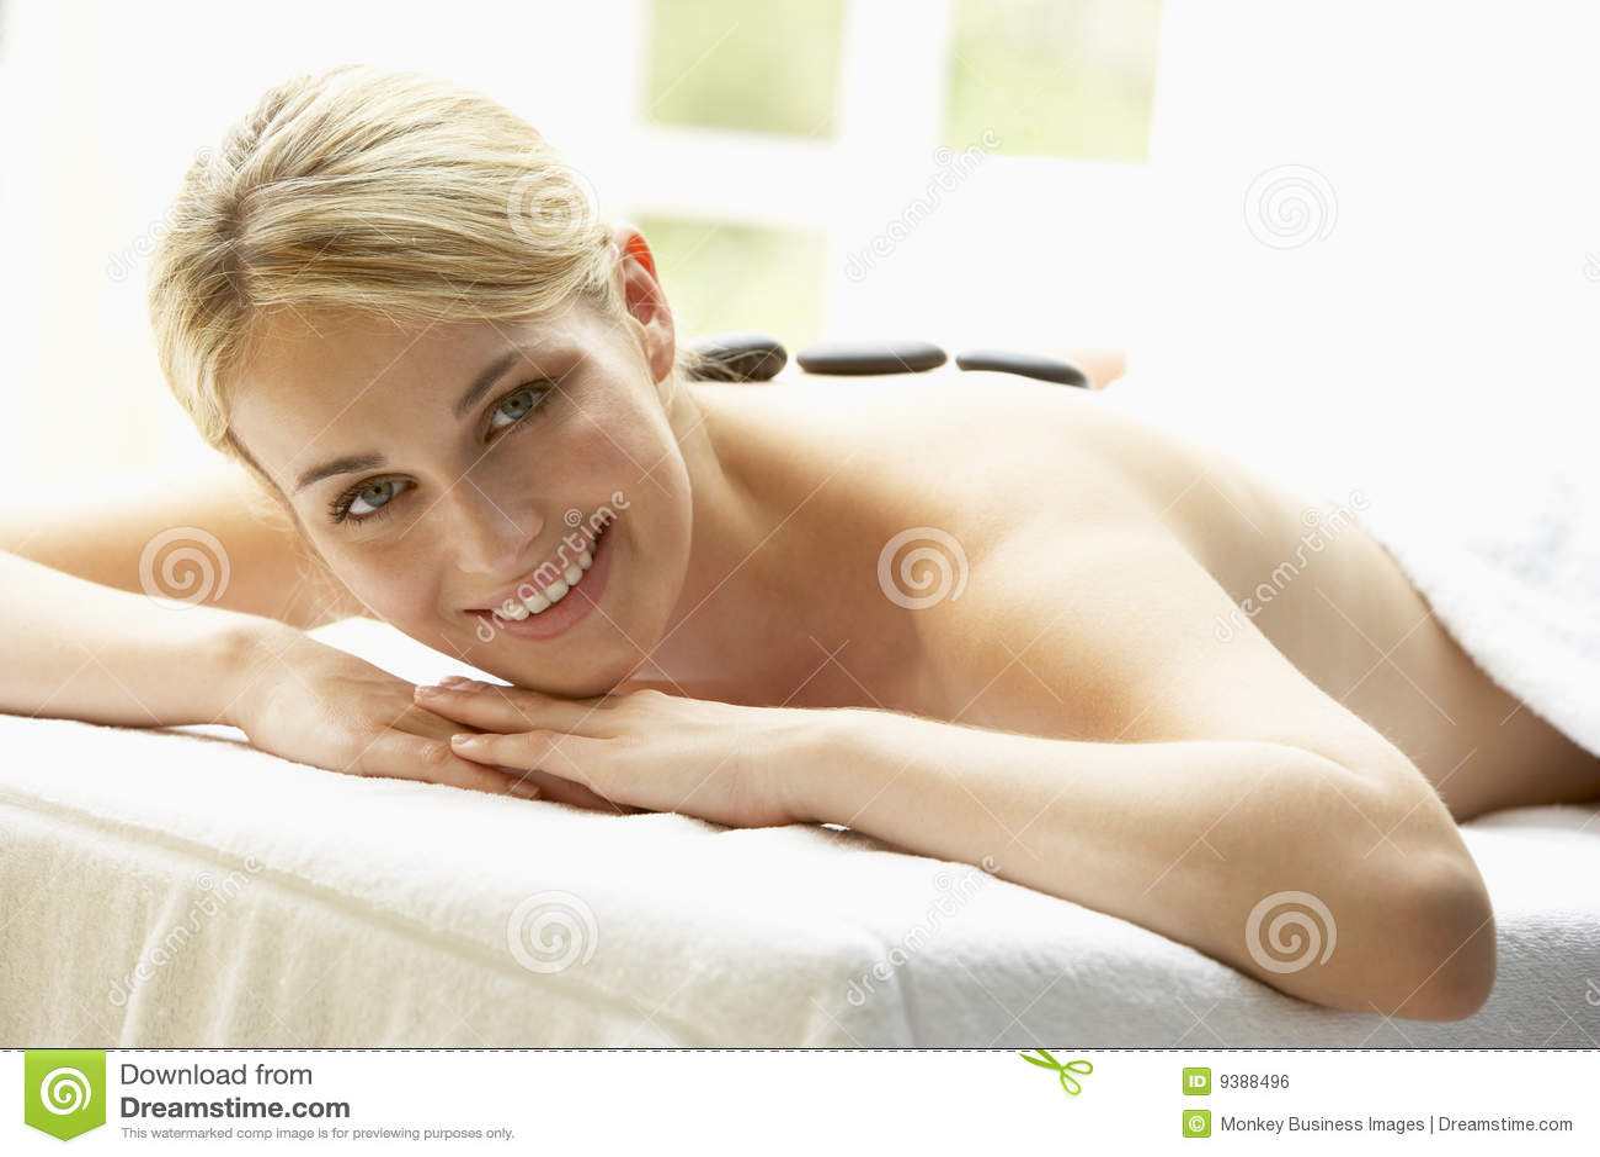 Enjoying hot stone treatment woman young